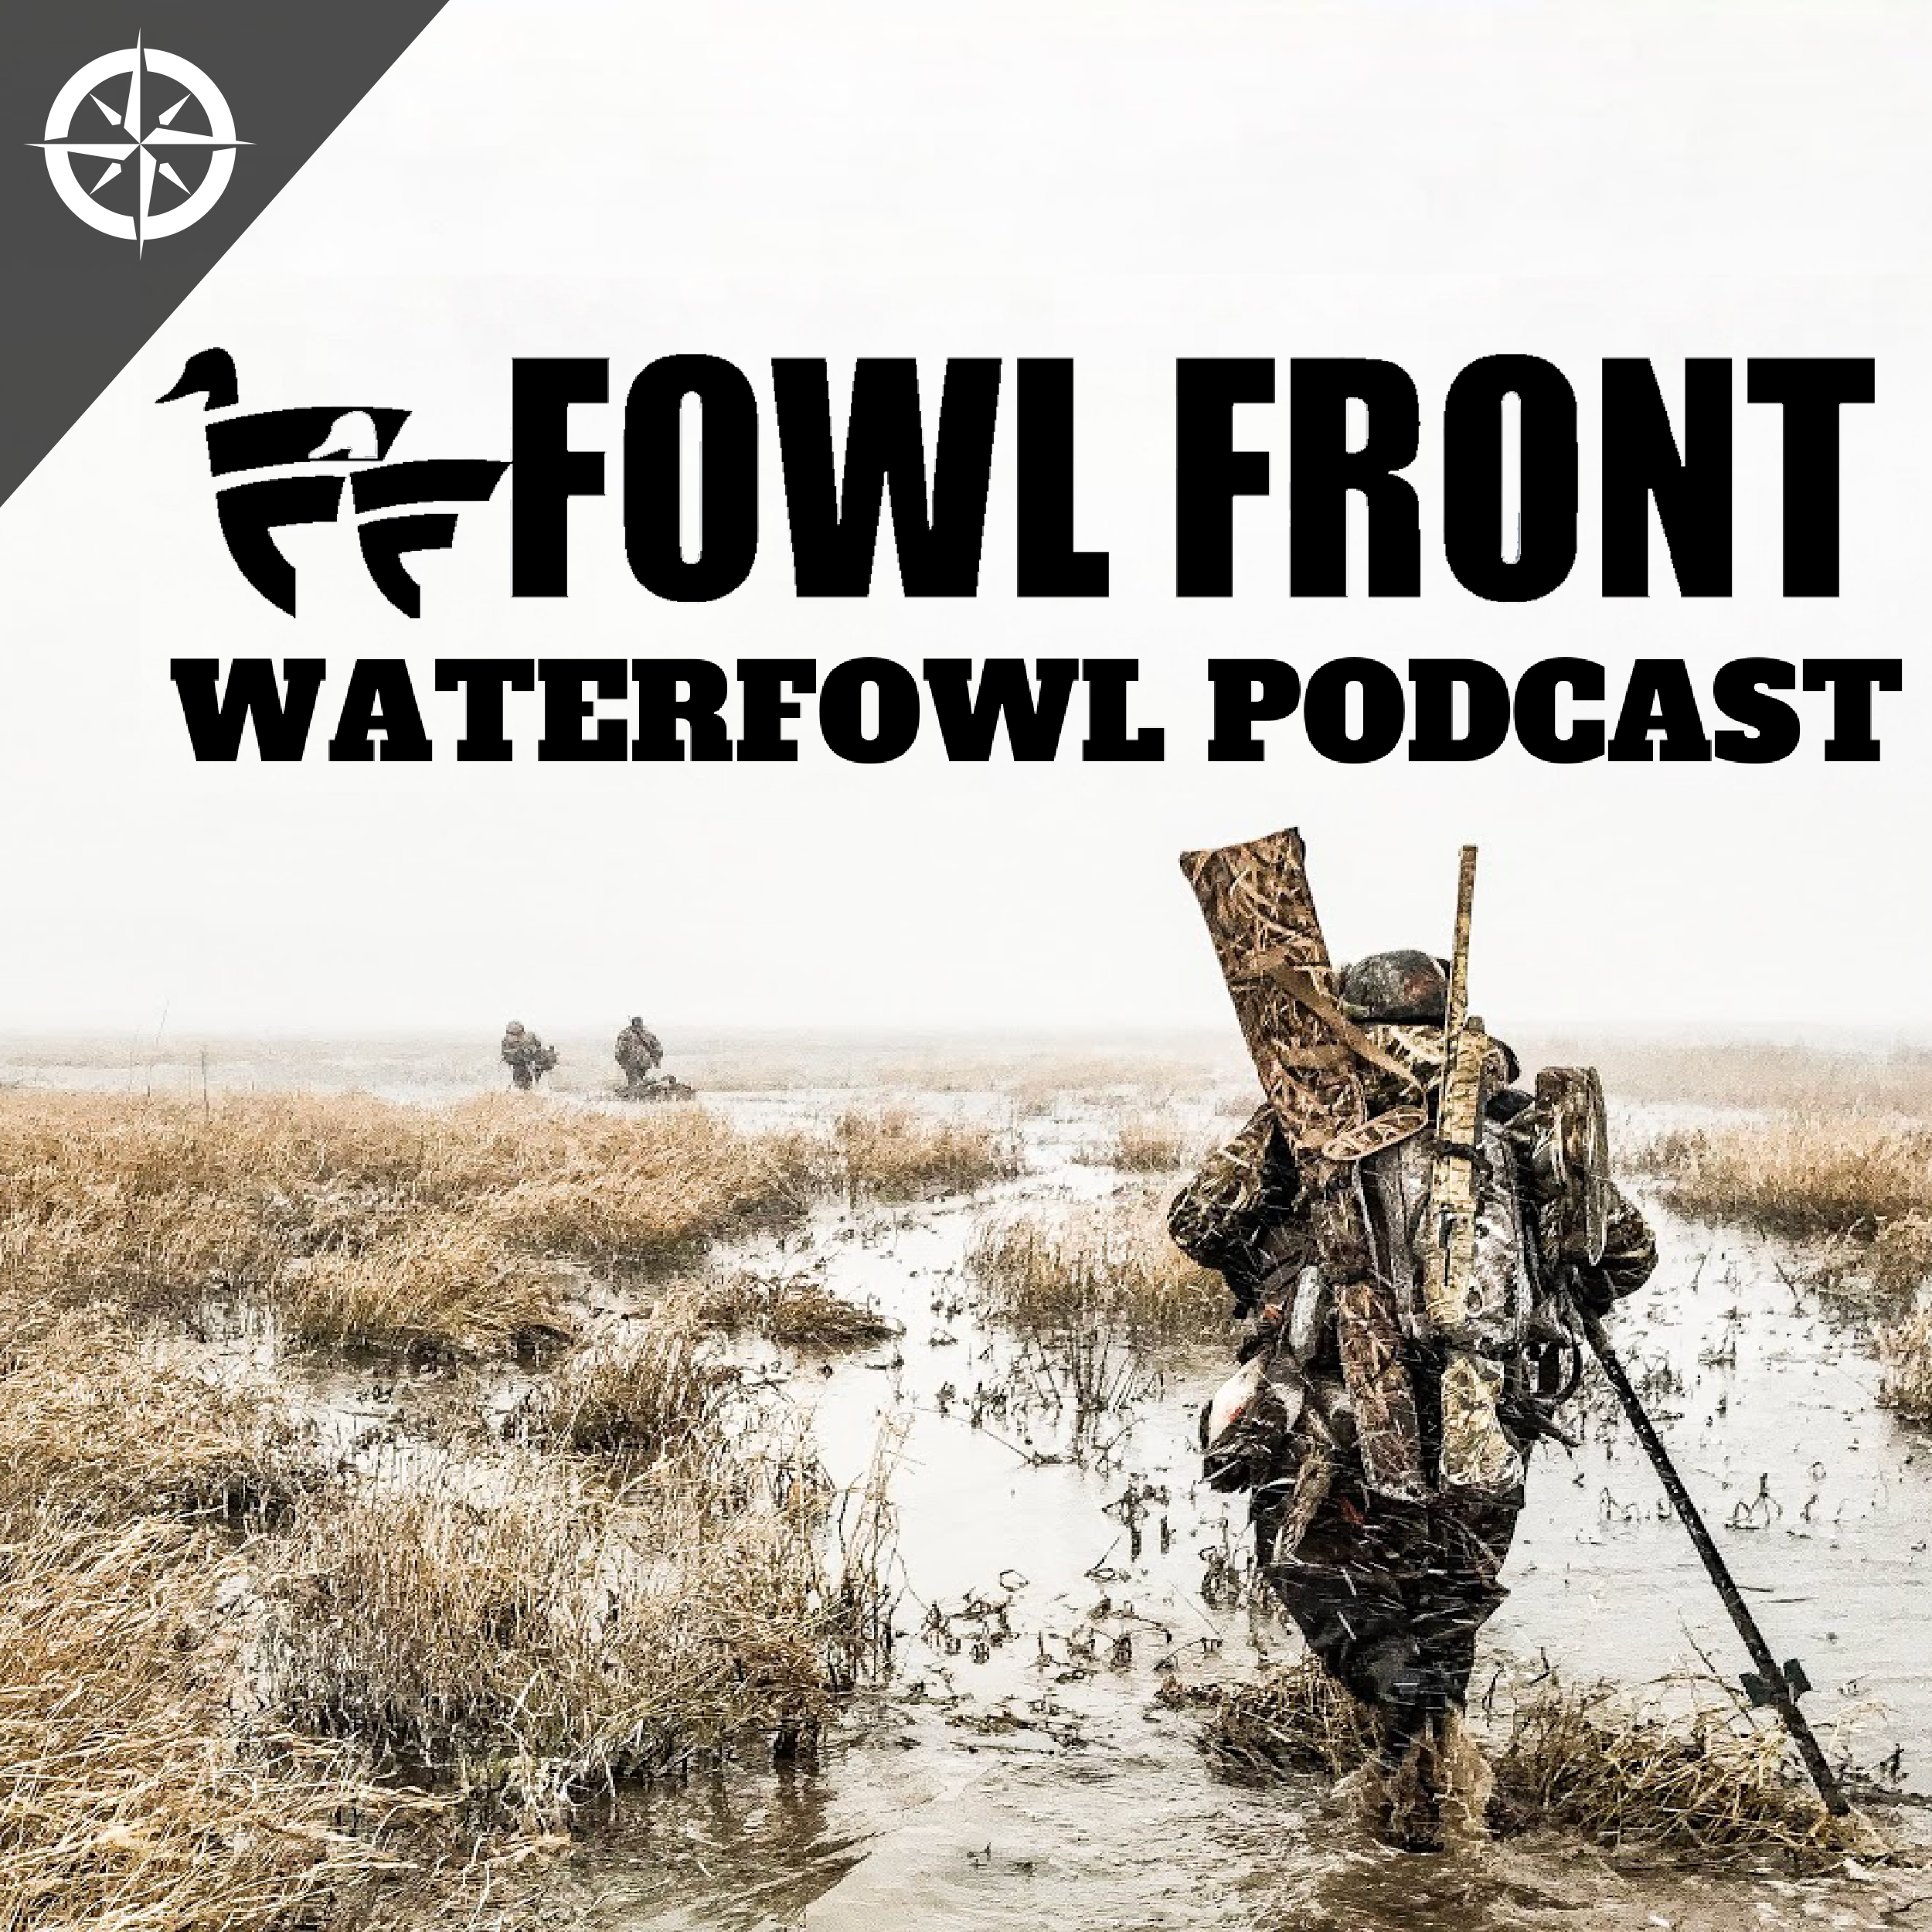 WOC-FowlFront-01.png